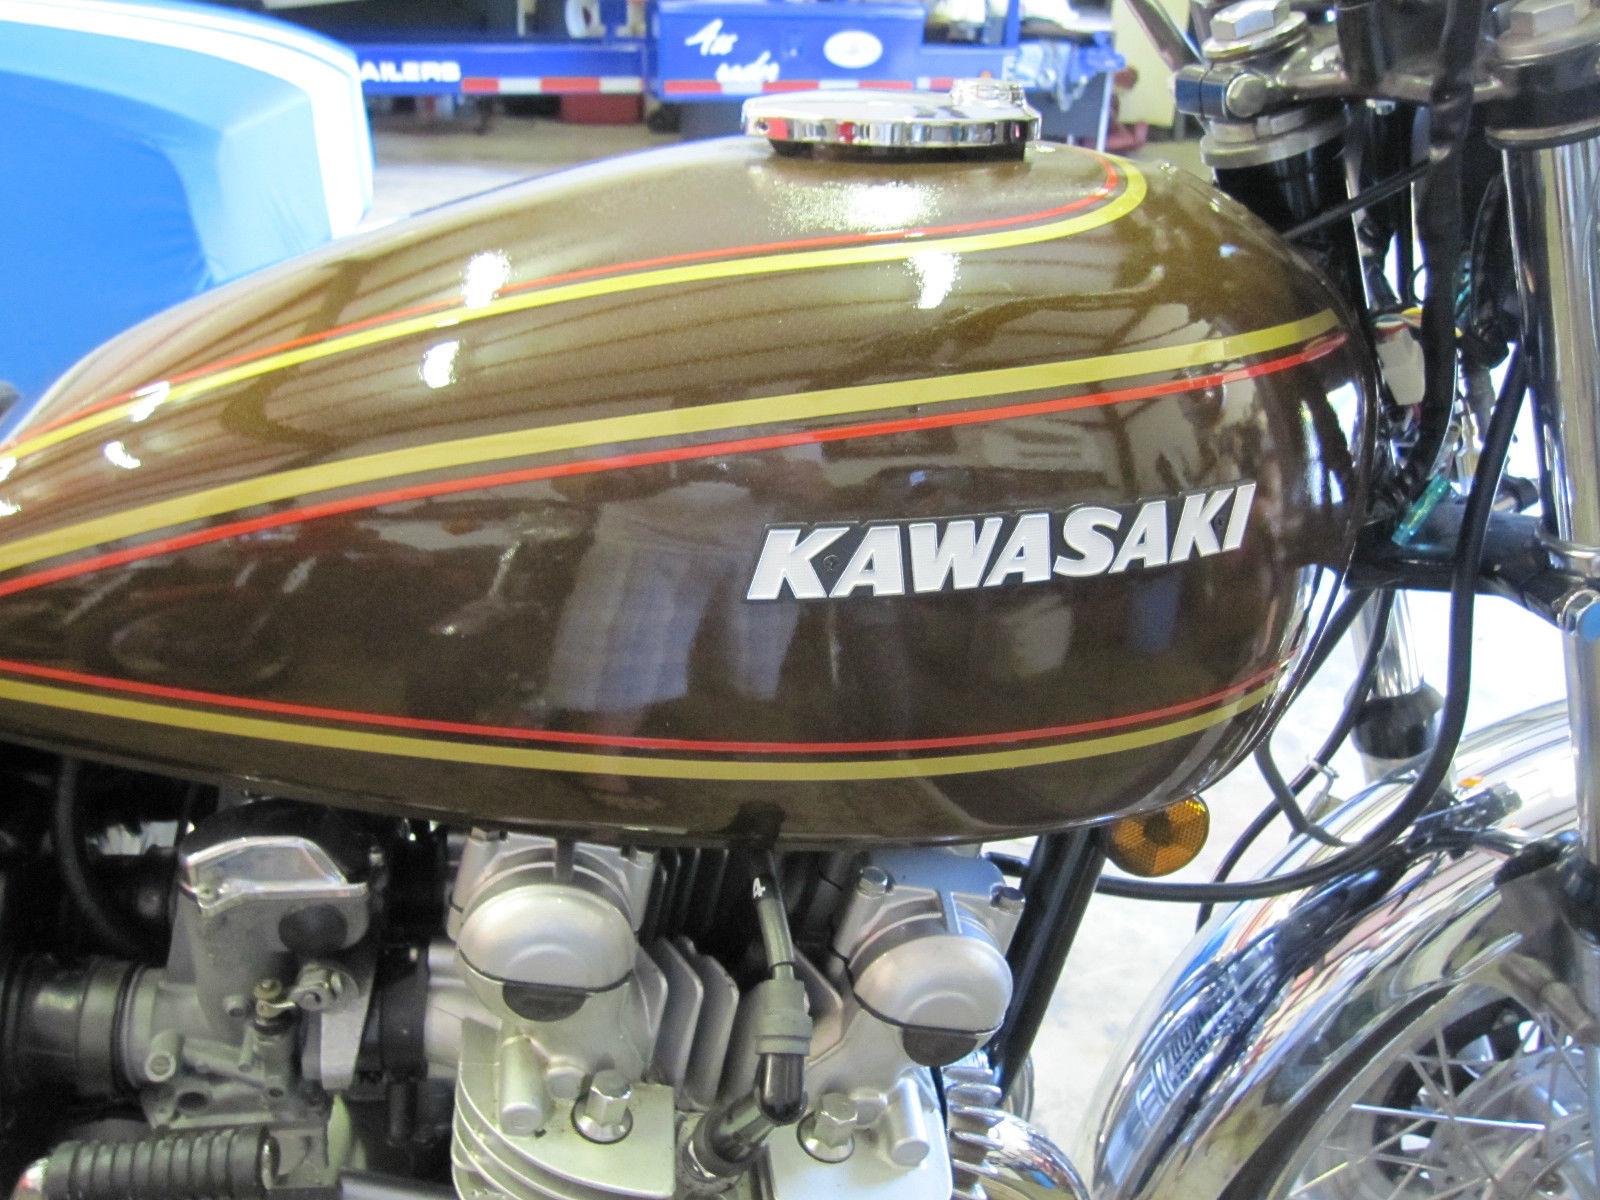 Kawasaki KZ900 - 1976 - Gas Tank, Kawasaki Badge and Fuel Cap.